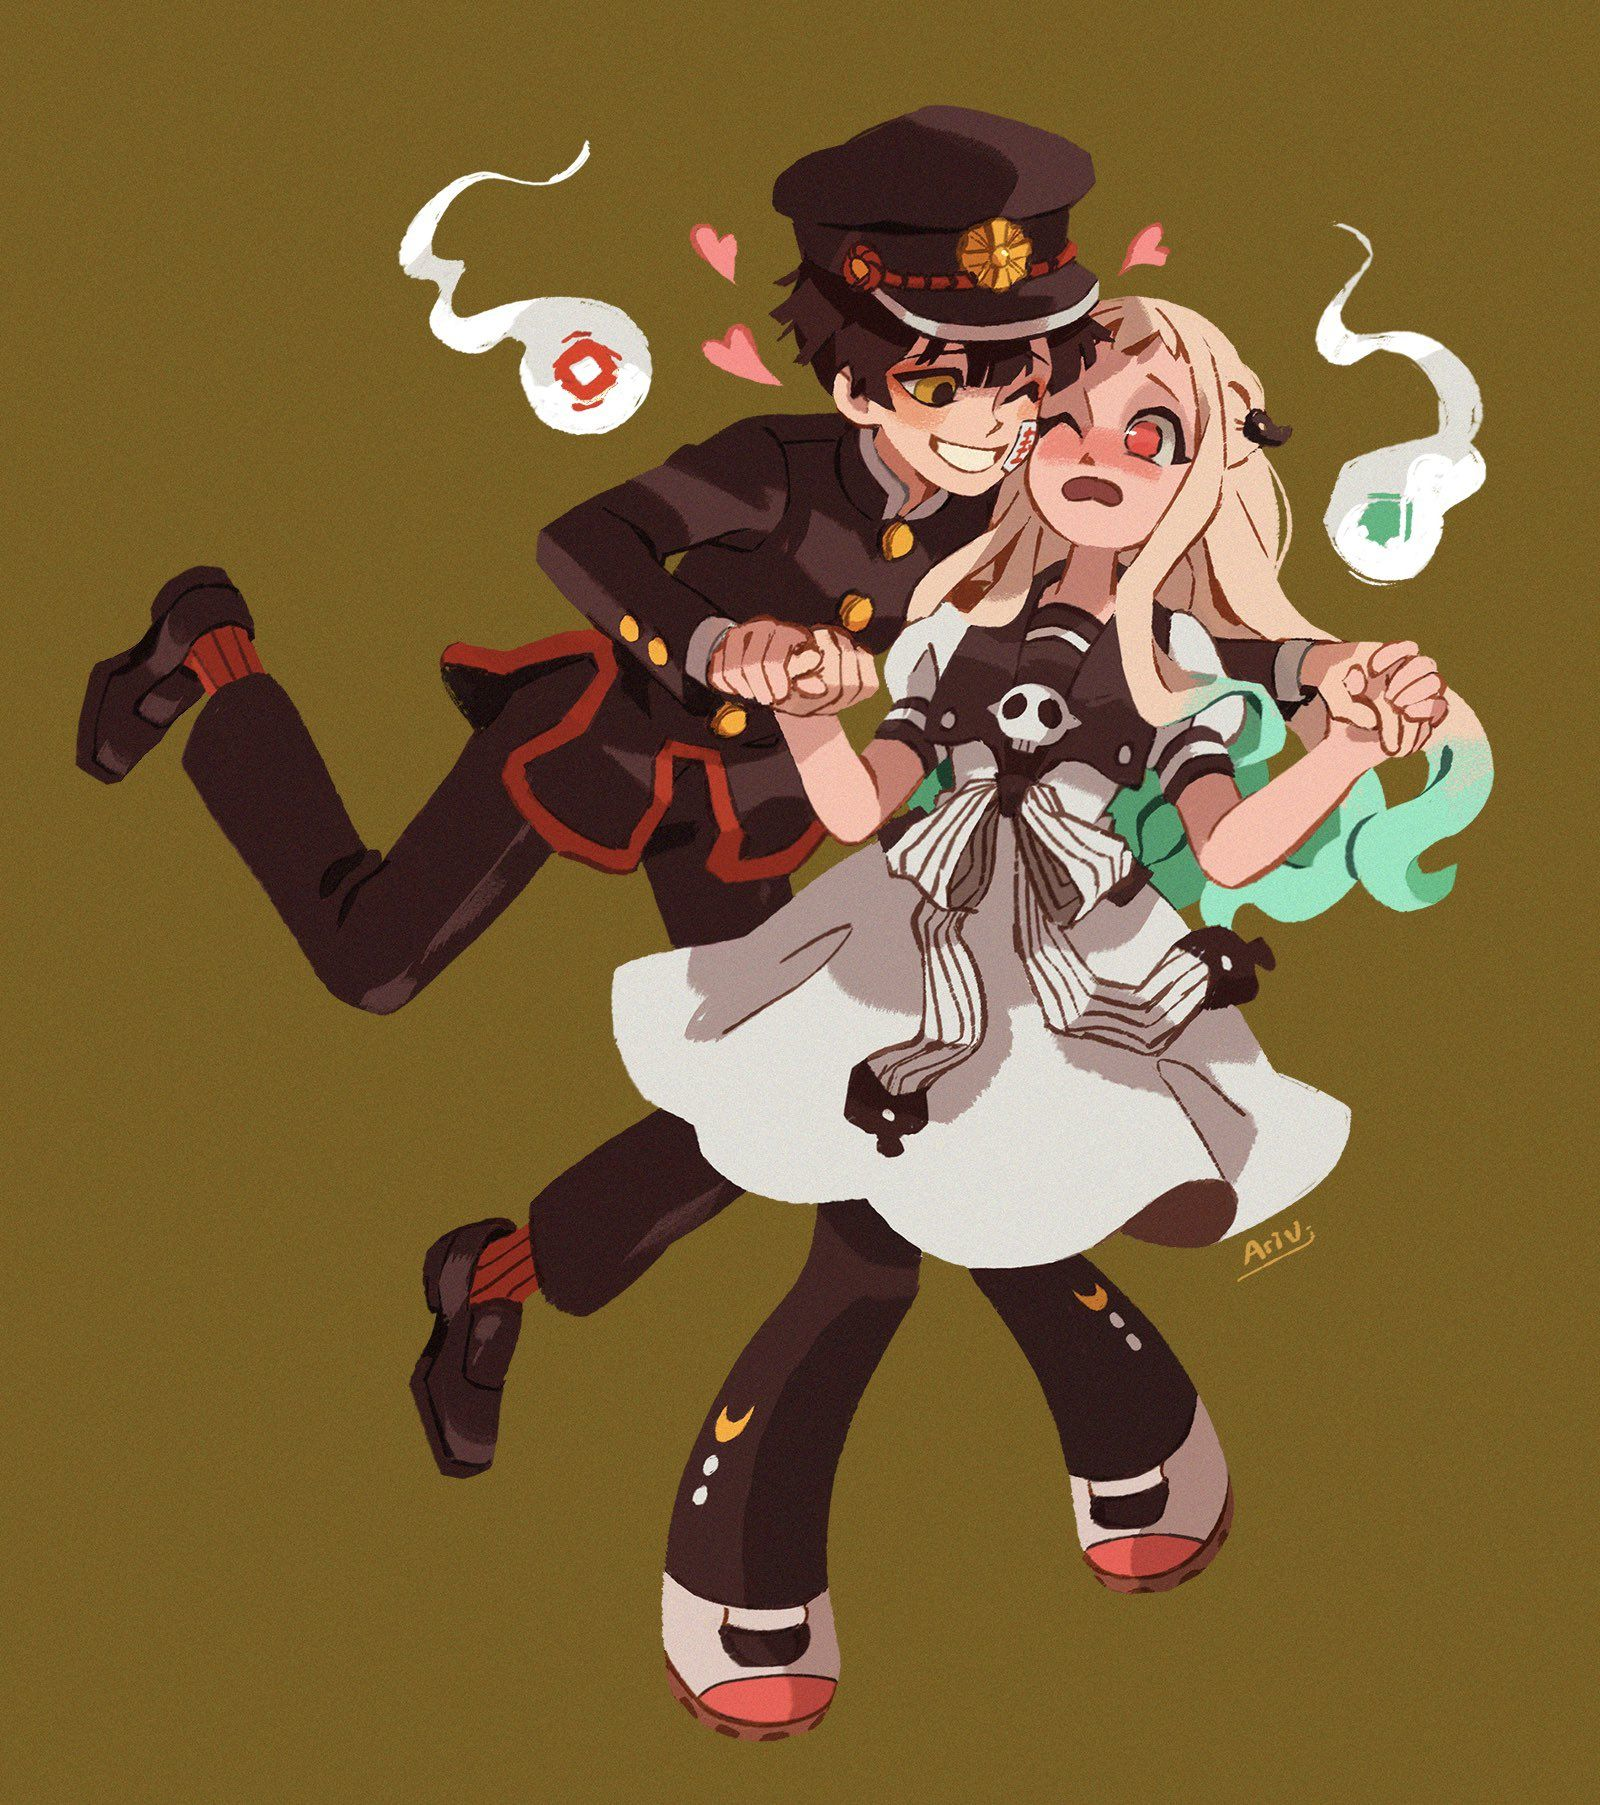 Fluff angst anime spoilers i do not own tbhk or their characters #angst #anime #fluff #hanakokun #manga #oneshotbook #romance #tbhk #toiletboundhanakokun #yashironene Hanako X Yashiro in 2020   Hanako, Anime ghost, Anime